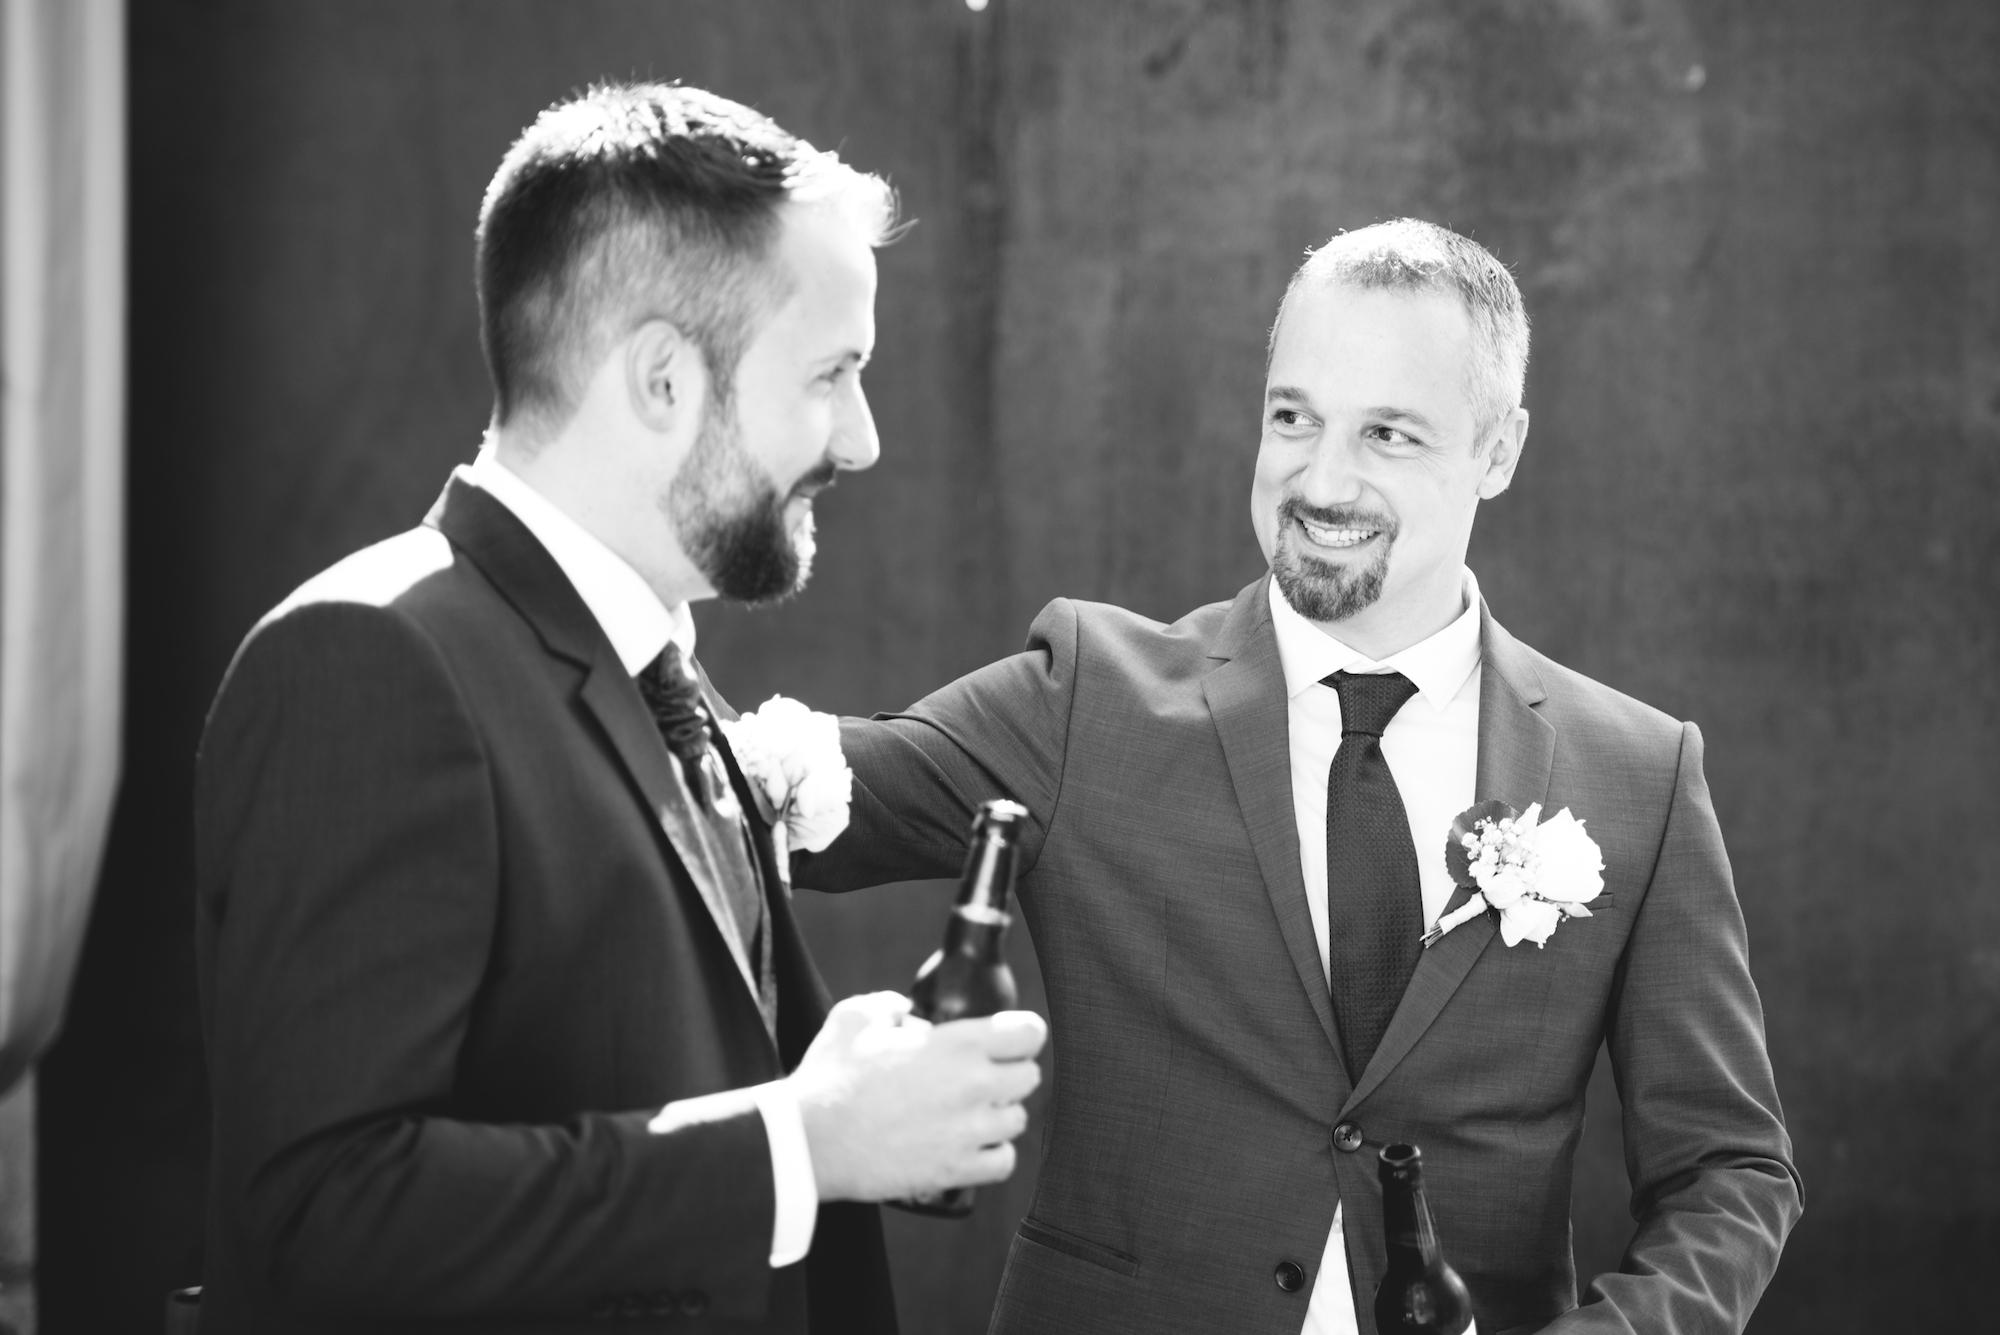 NadiaundMichael_Hochzeit_BekaBitterliFotografie_109.jpg